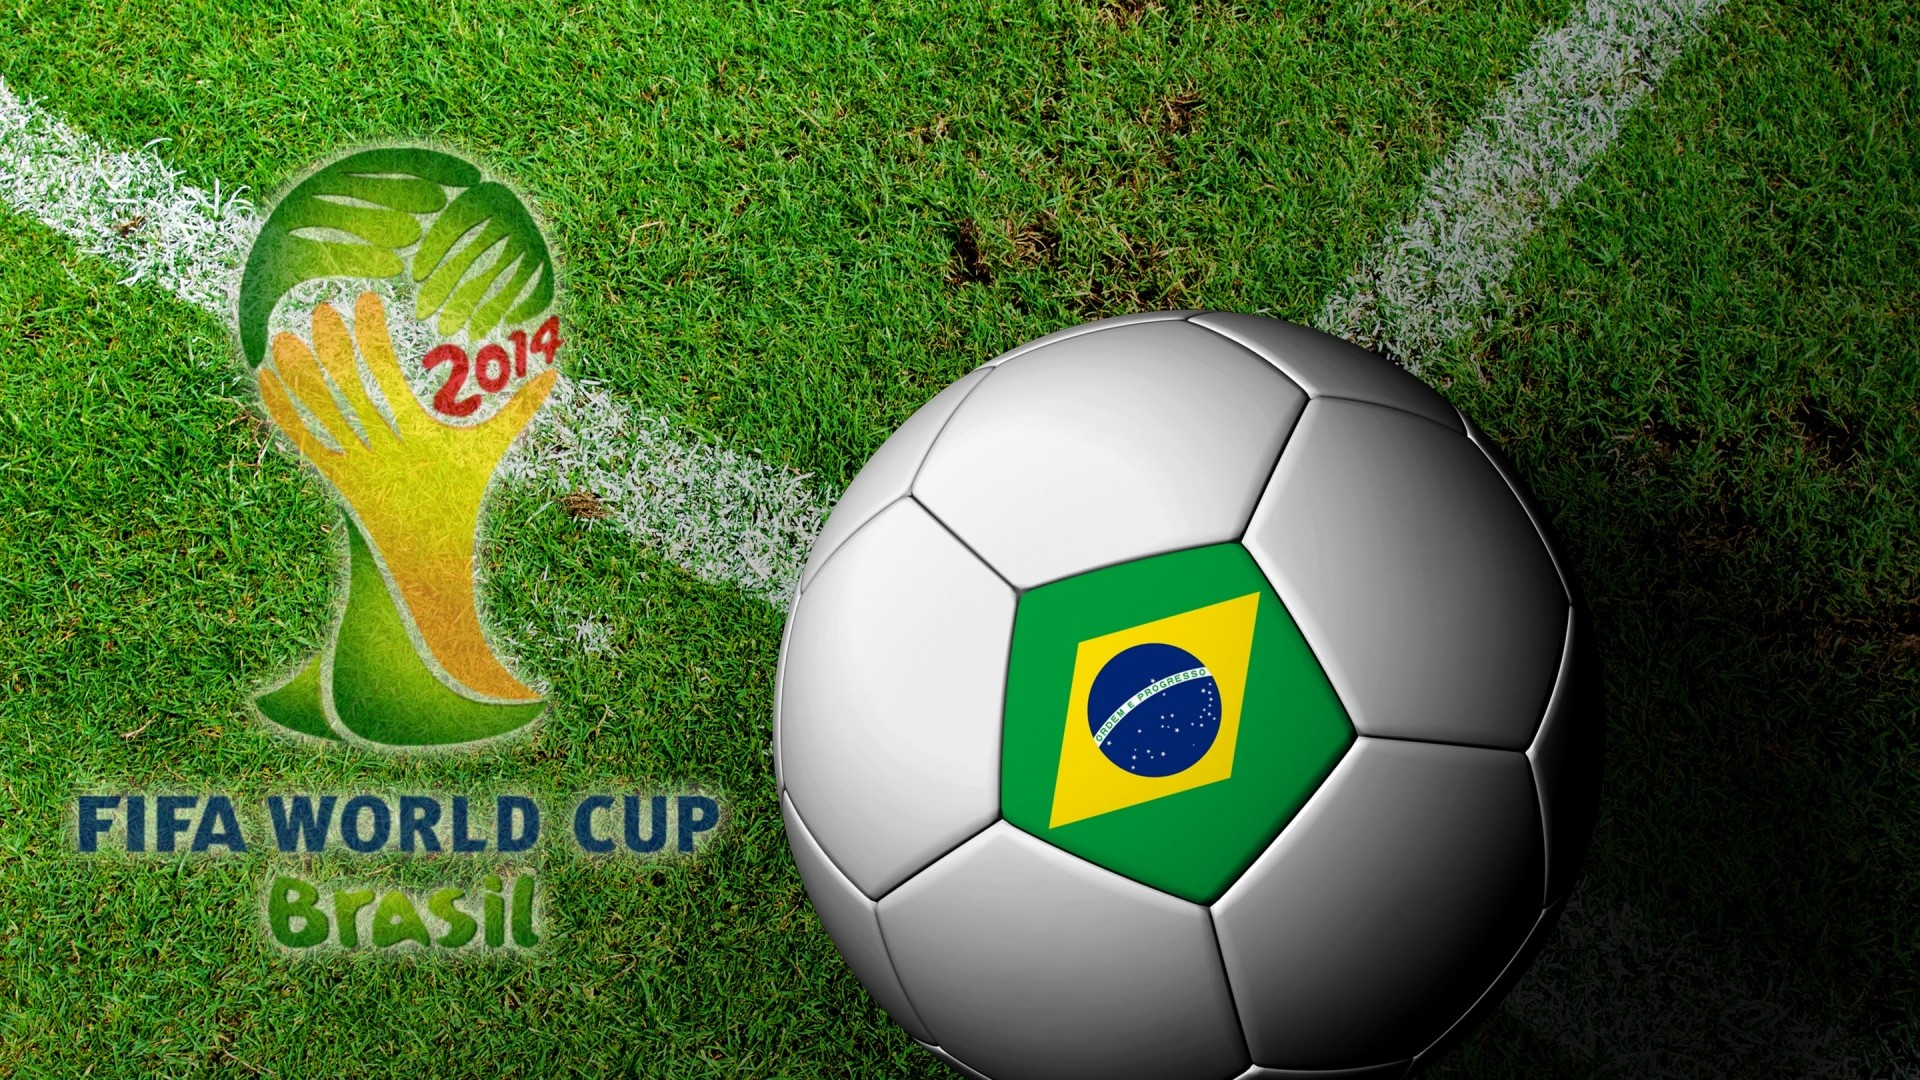 Wallpaper brasil, fifa, world cup, 2014, football, ball